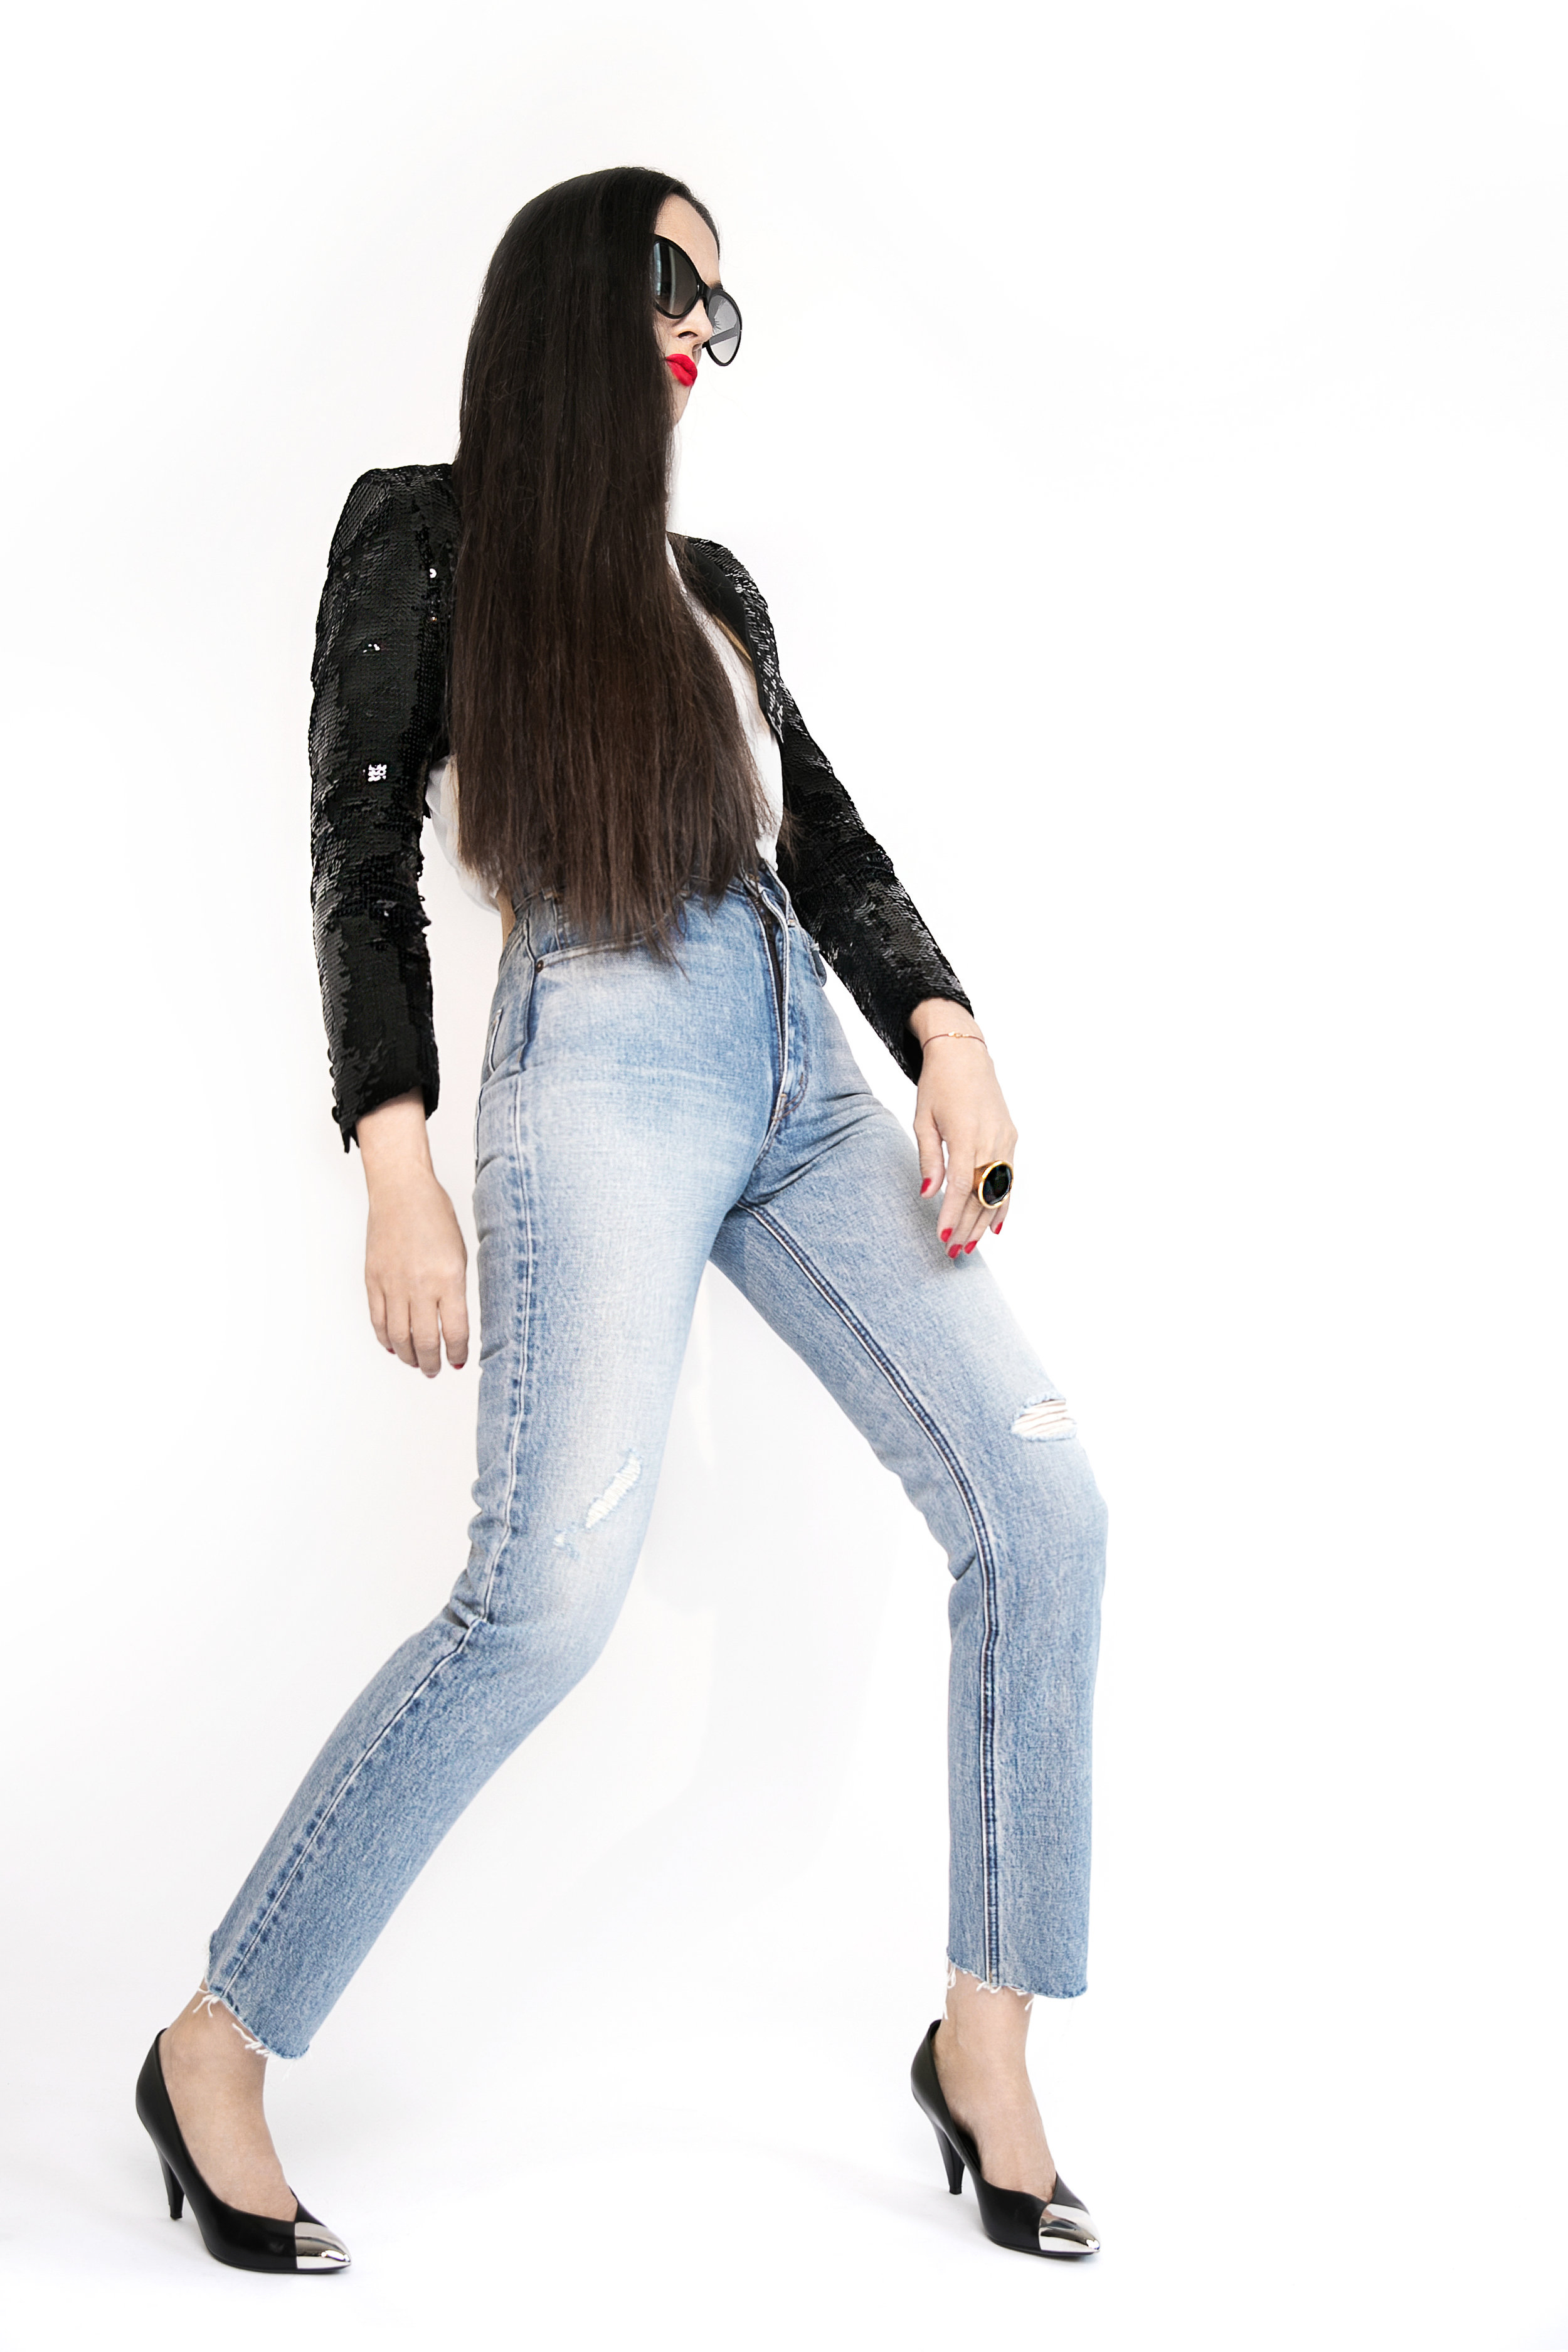 Top, denim jeans and shoes Céline, sunglasses Tom Ford. Photo  Lena Di